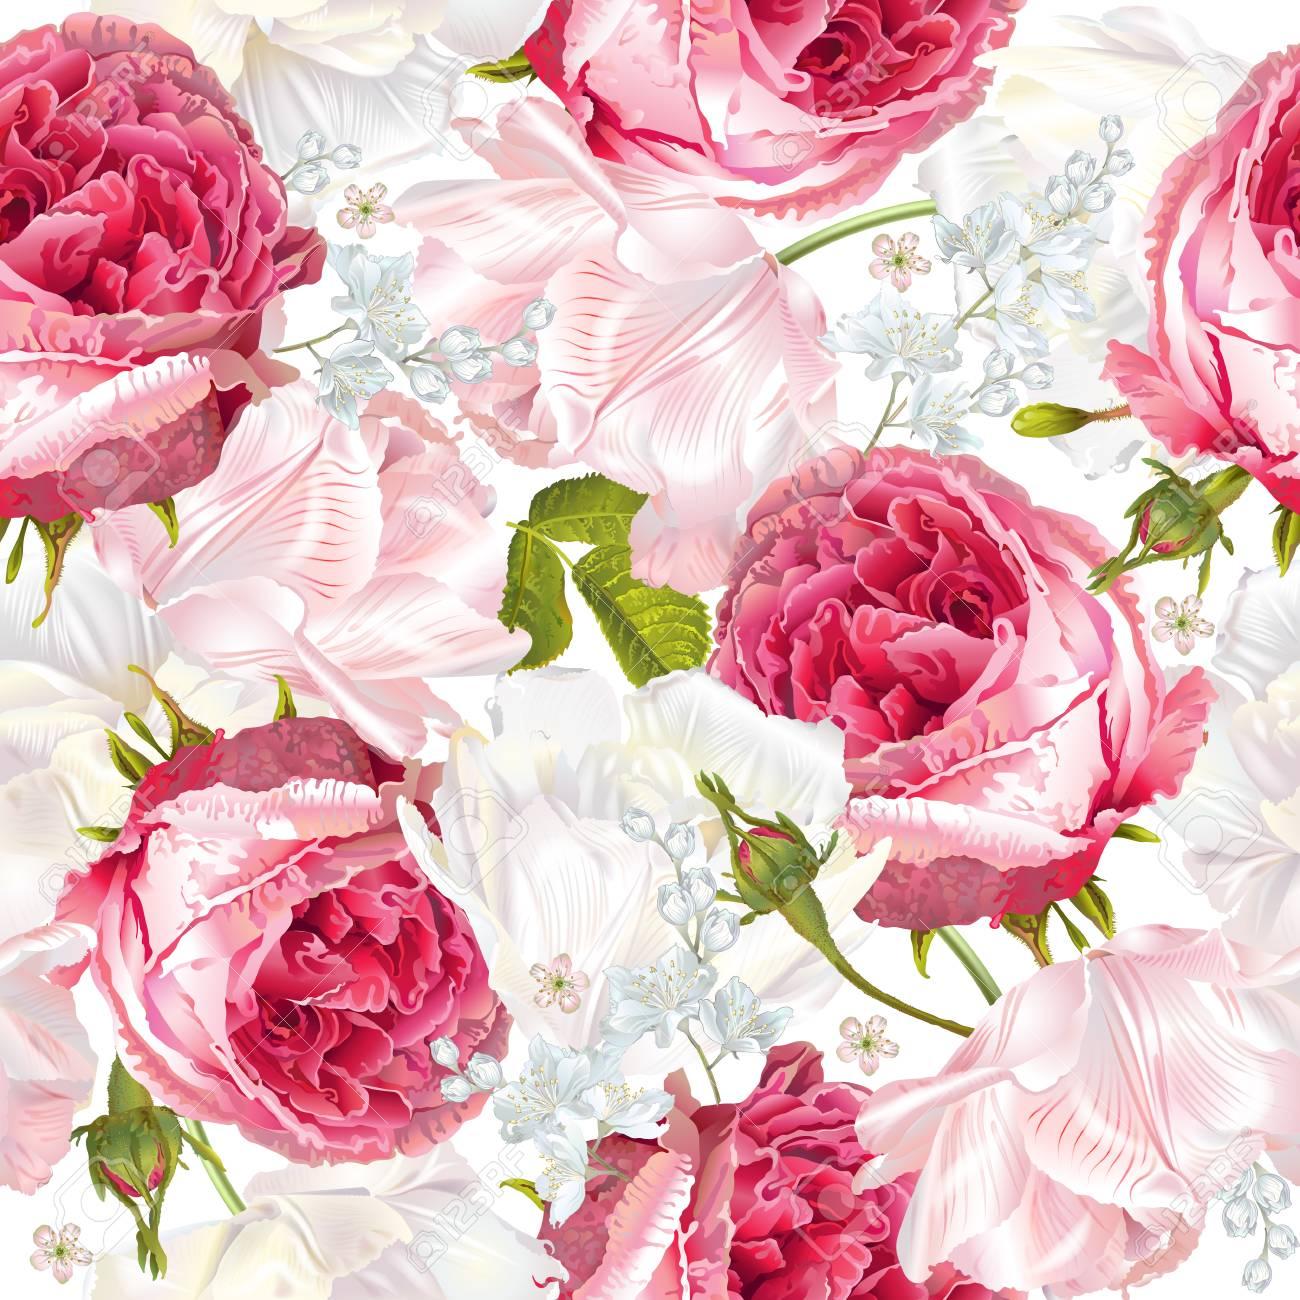 Romantic flowers vertical banner - 77238612